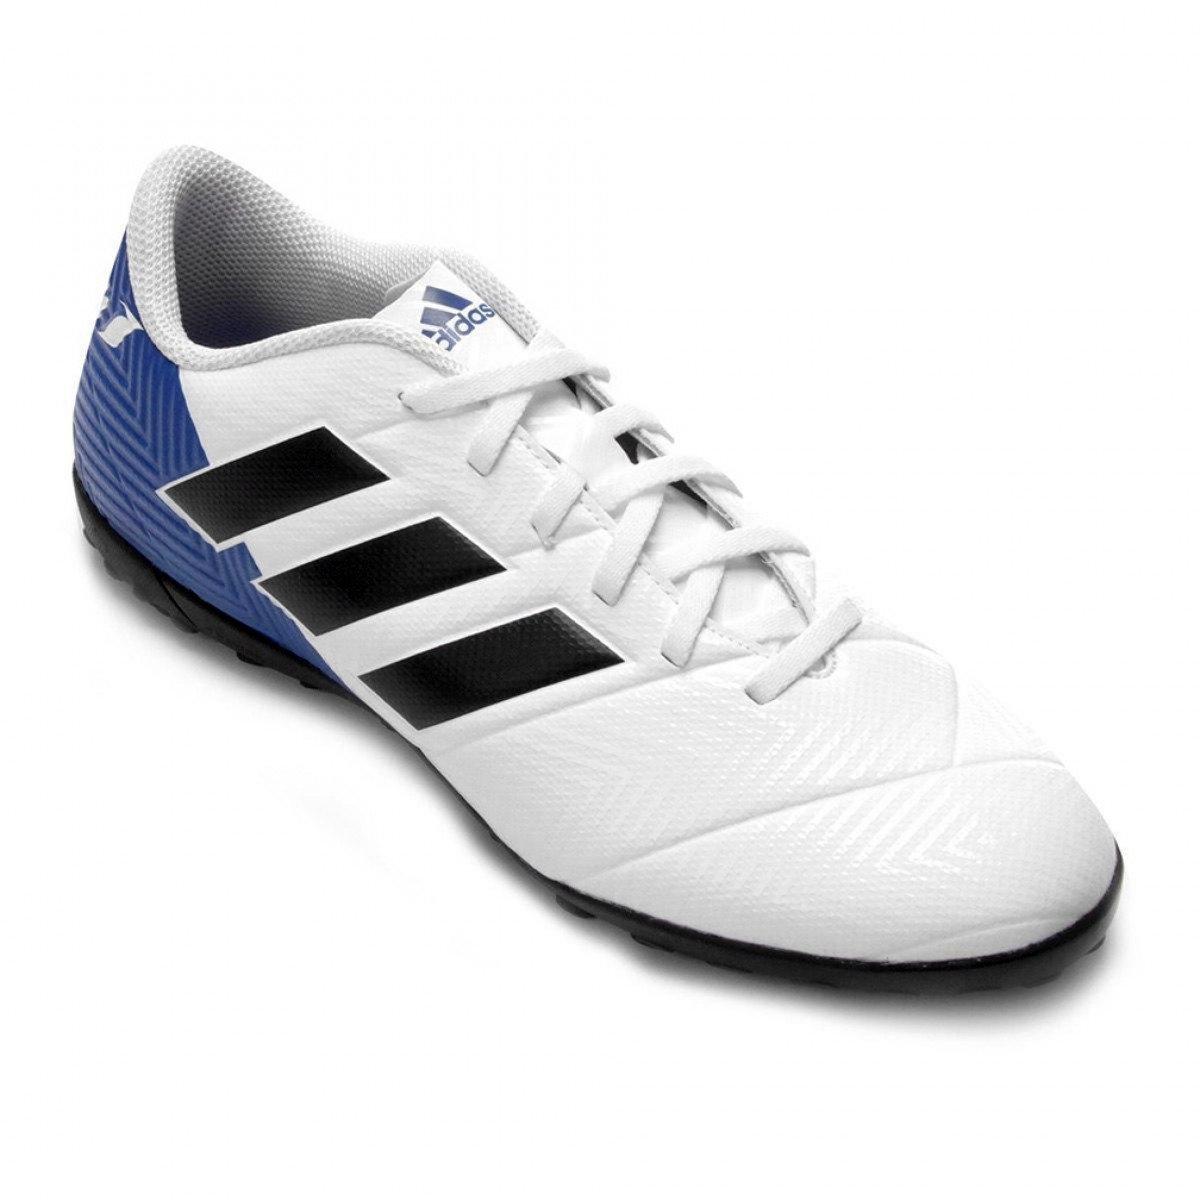 Chuteira Society Adidas Nemeziz Messi Tango 18.4 - Branco e Azul ... eaeed34c2bf70